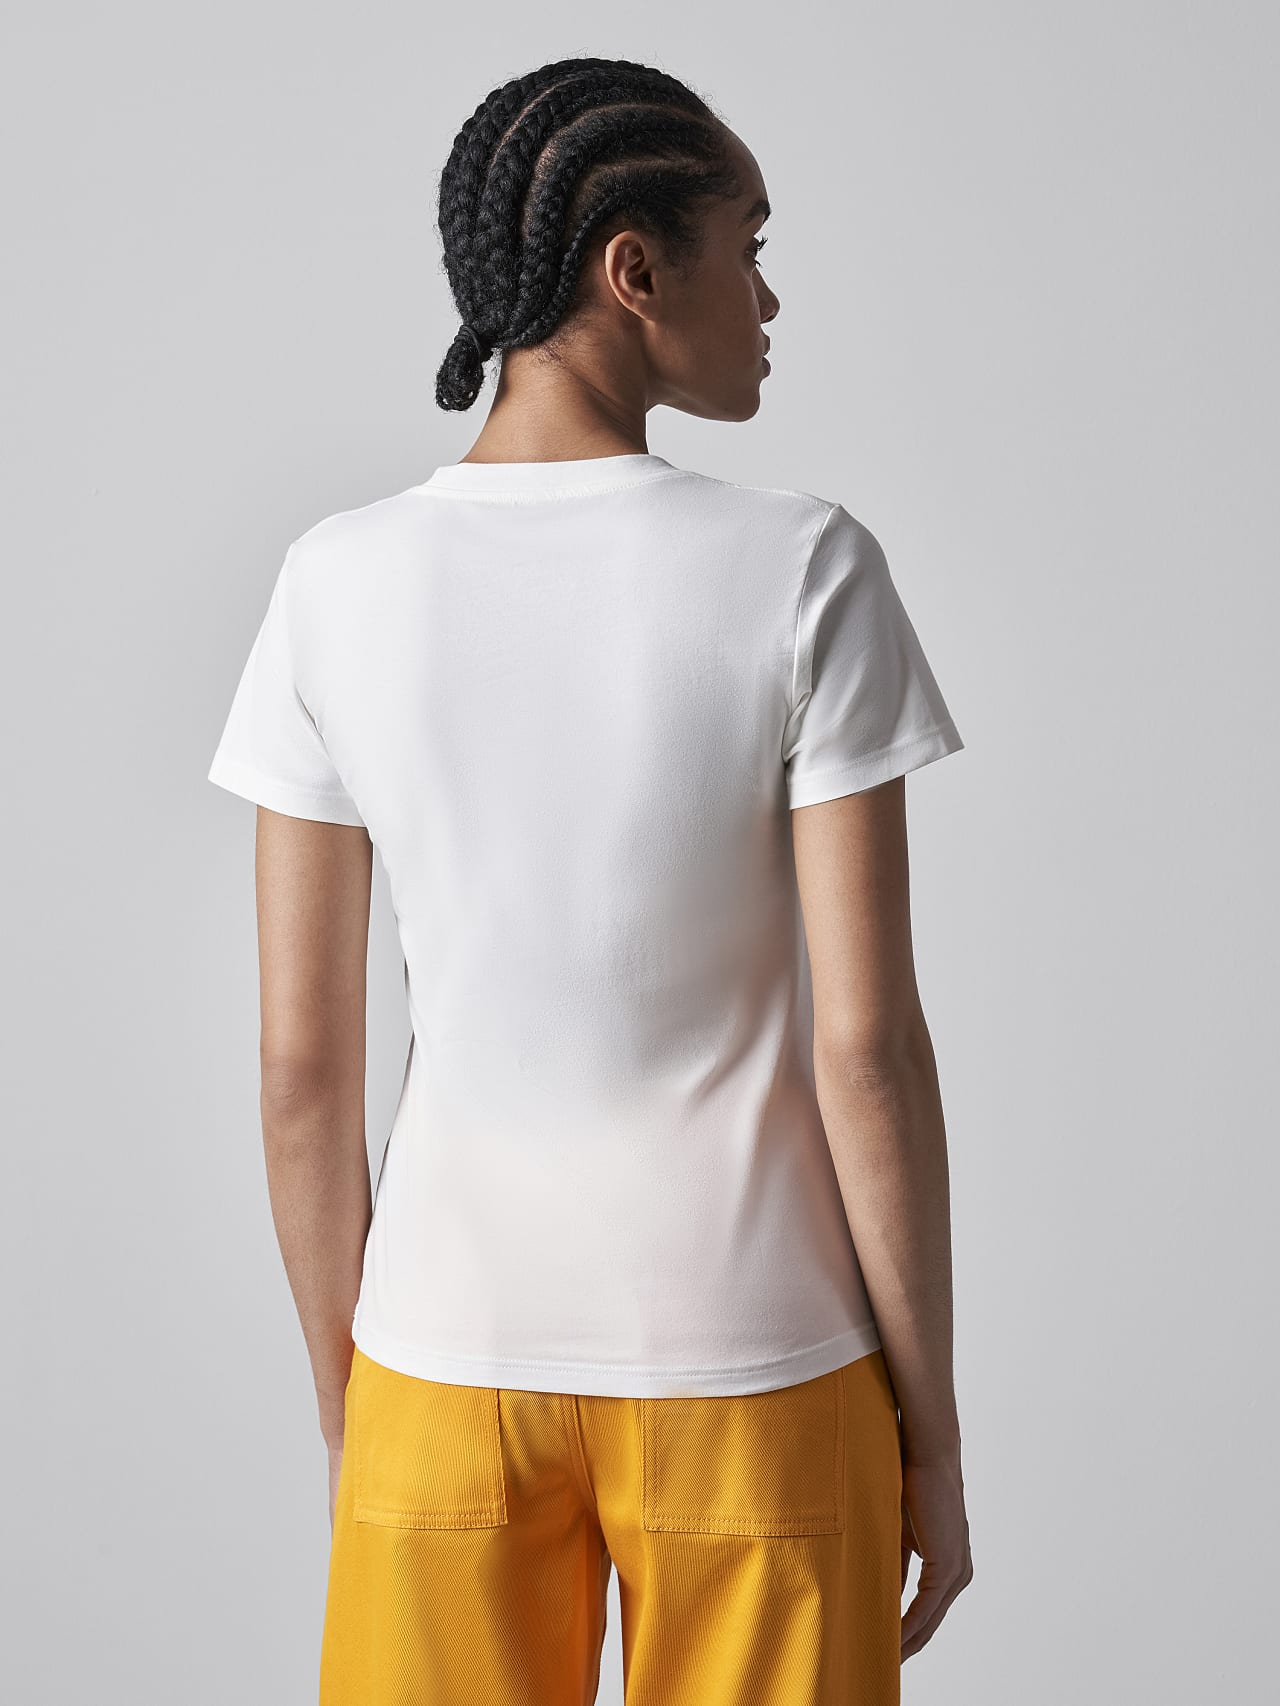 JOCTI V3.Y5.02 Logo T-Shirt offwhite Front Main Alpha Tauri